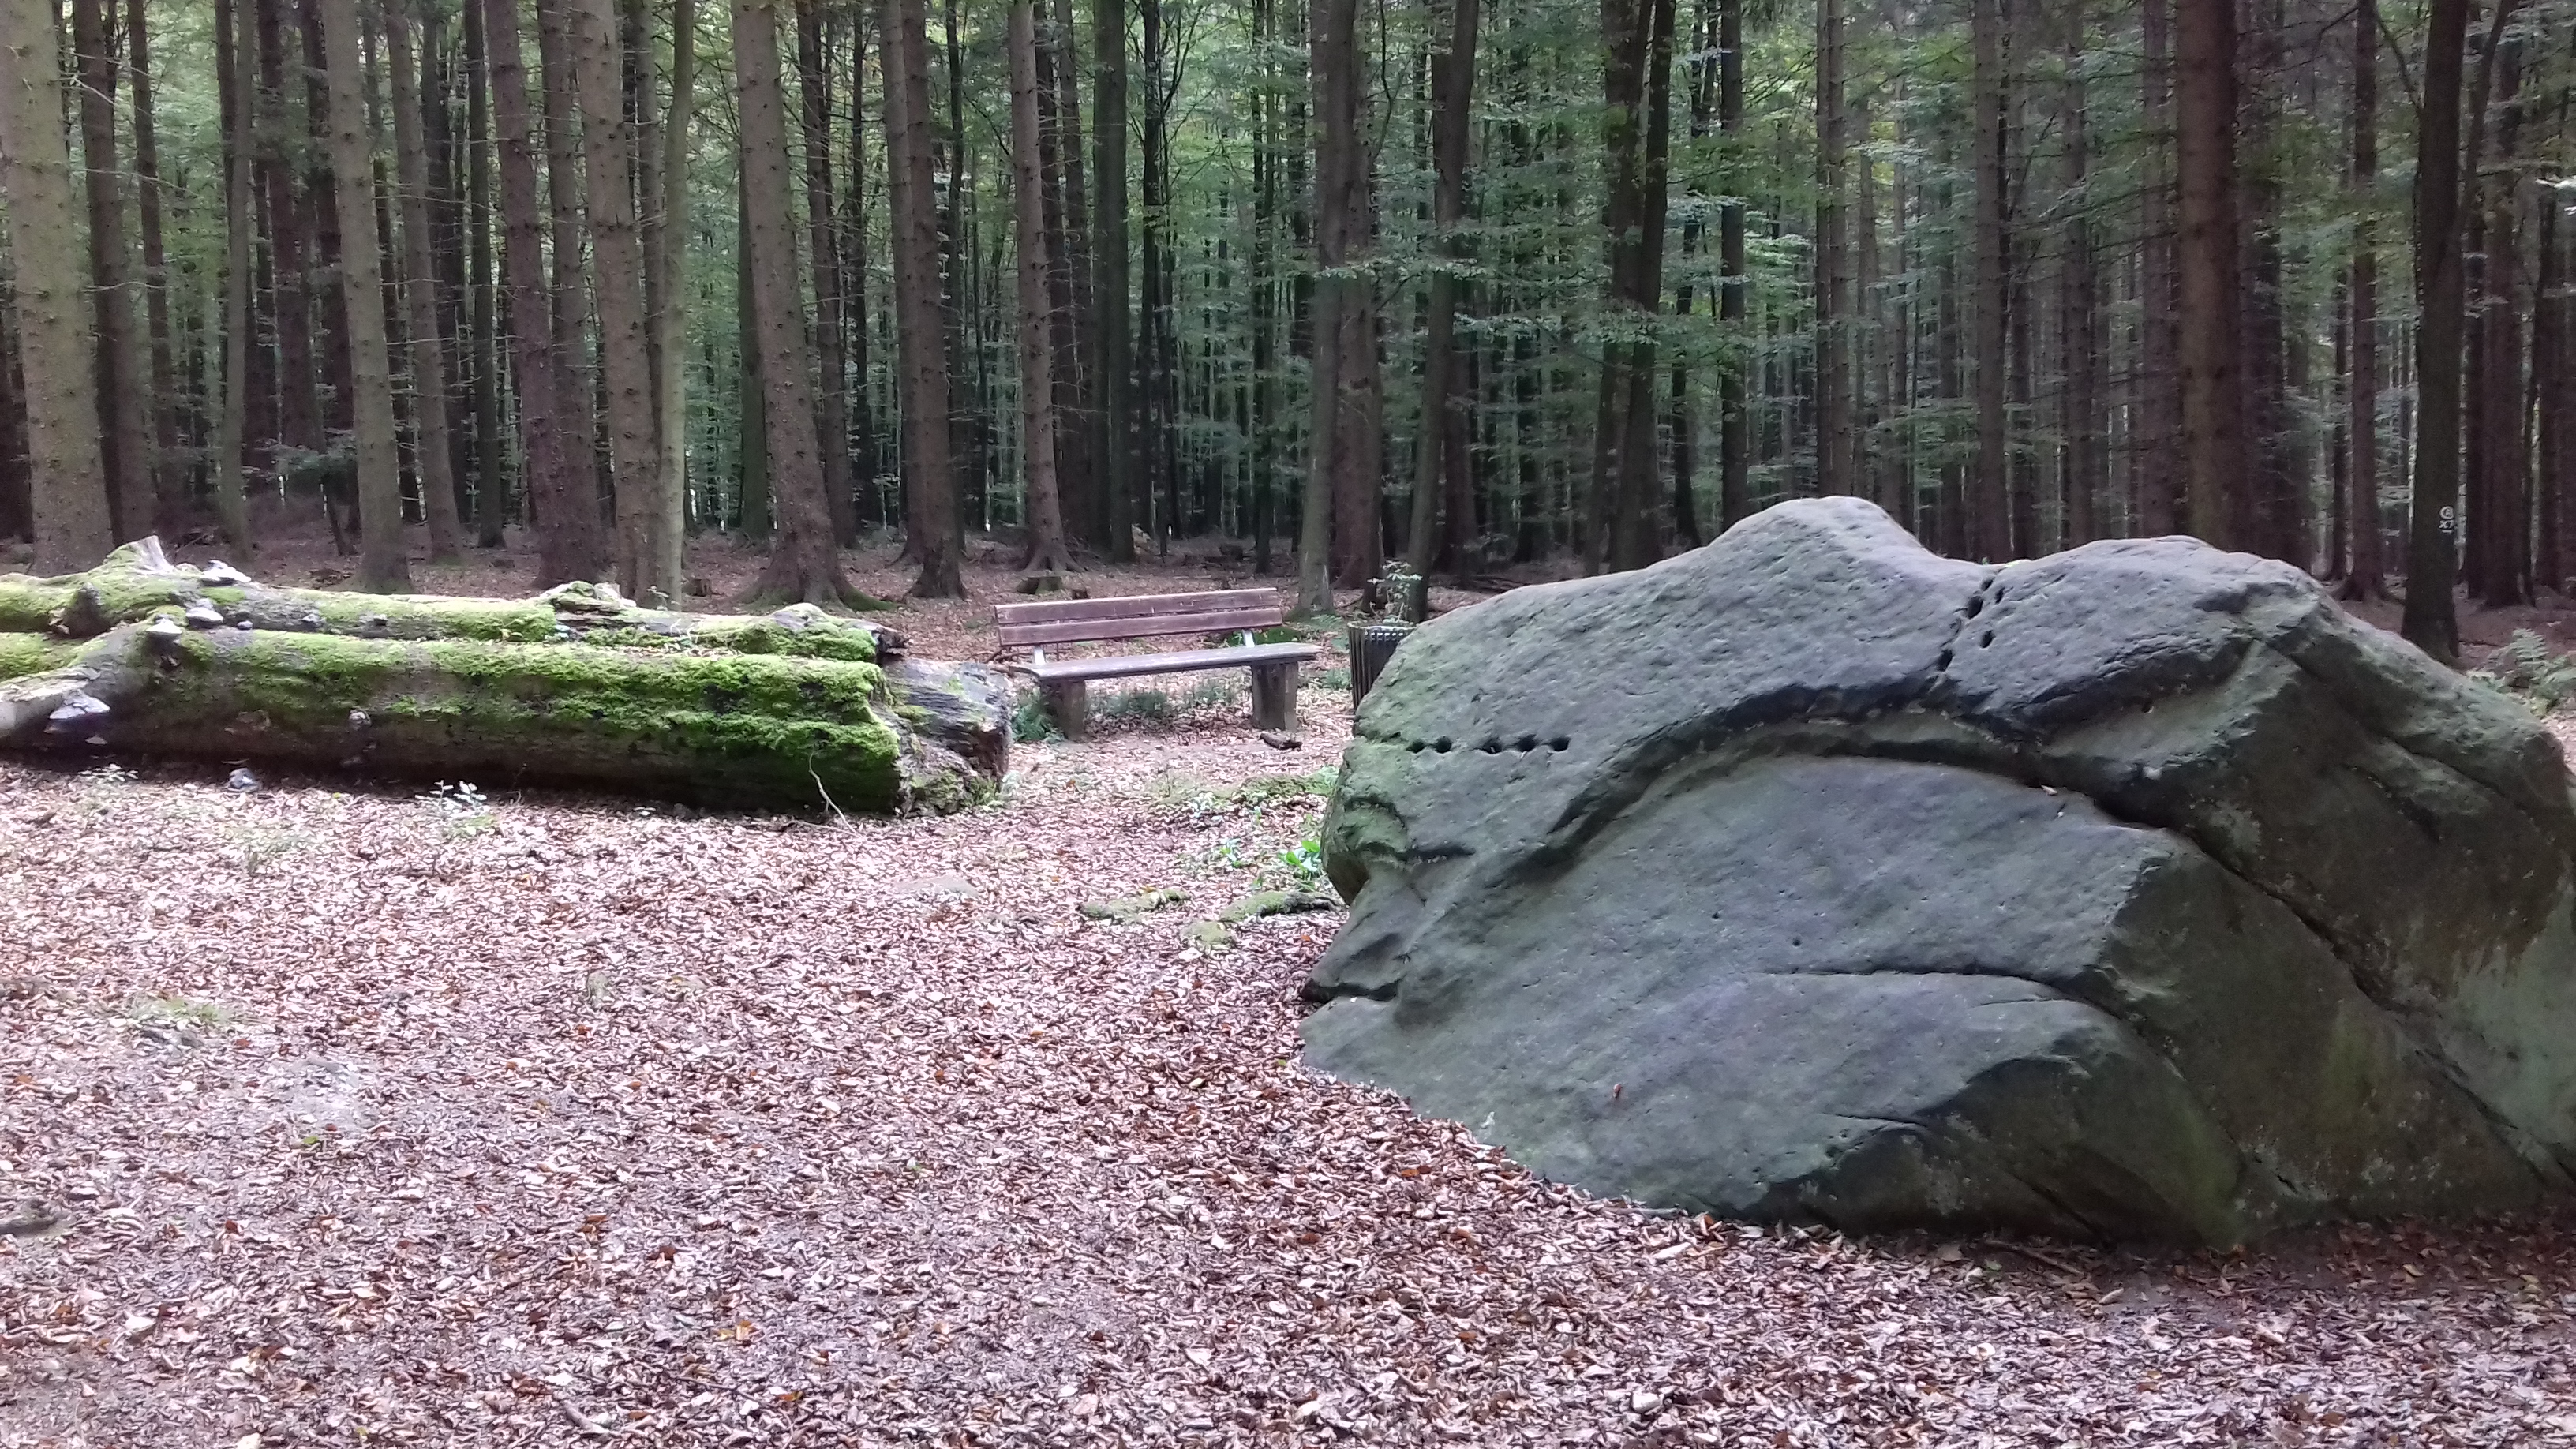 Leistruper Wald Route